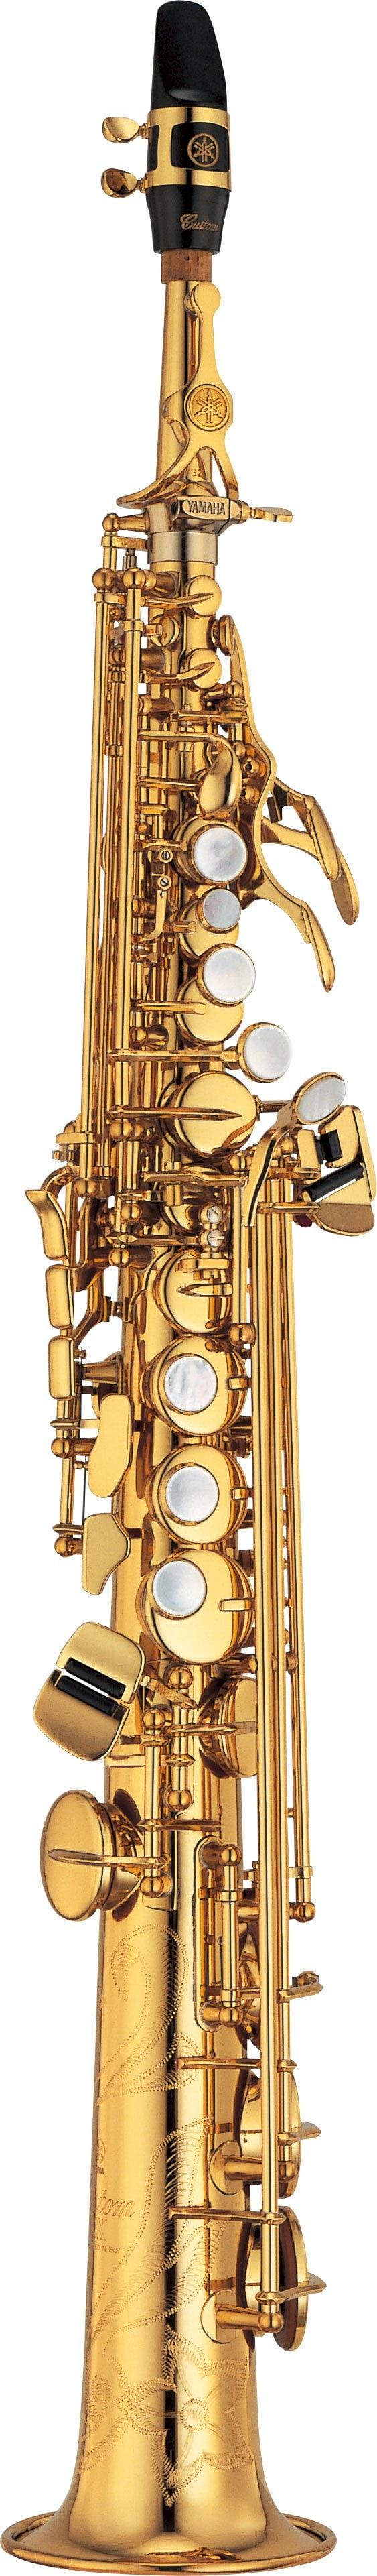 Yss 875ex 875exhg overview saxophones brass for Yamaha custom ex soprano